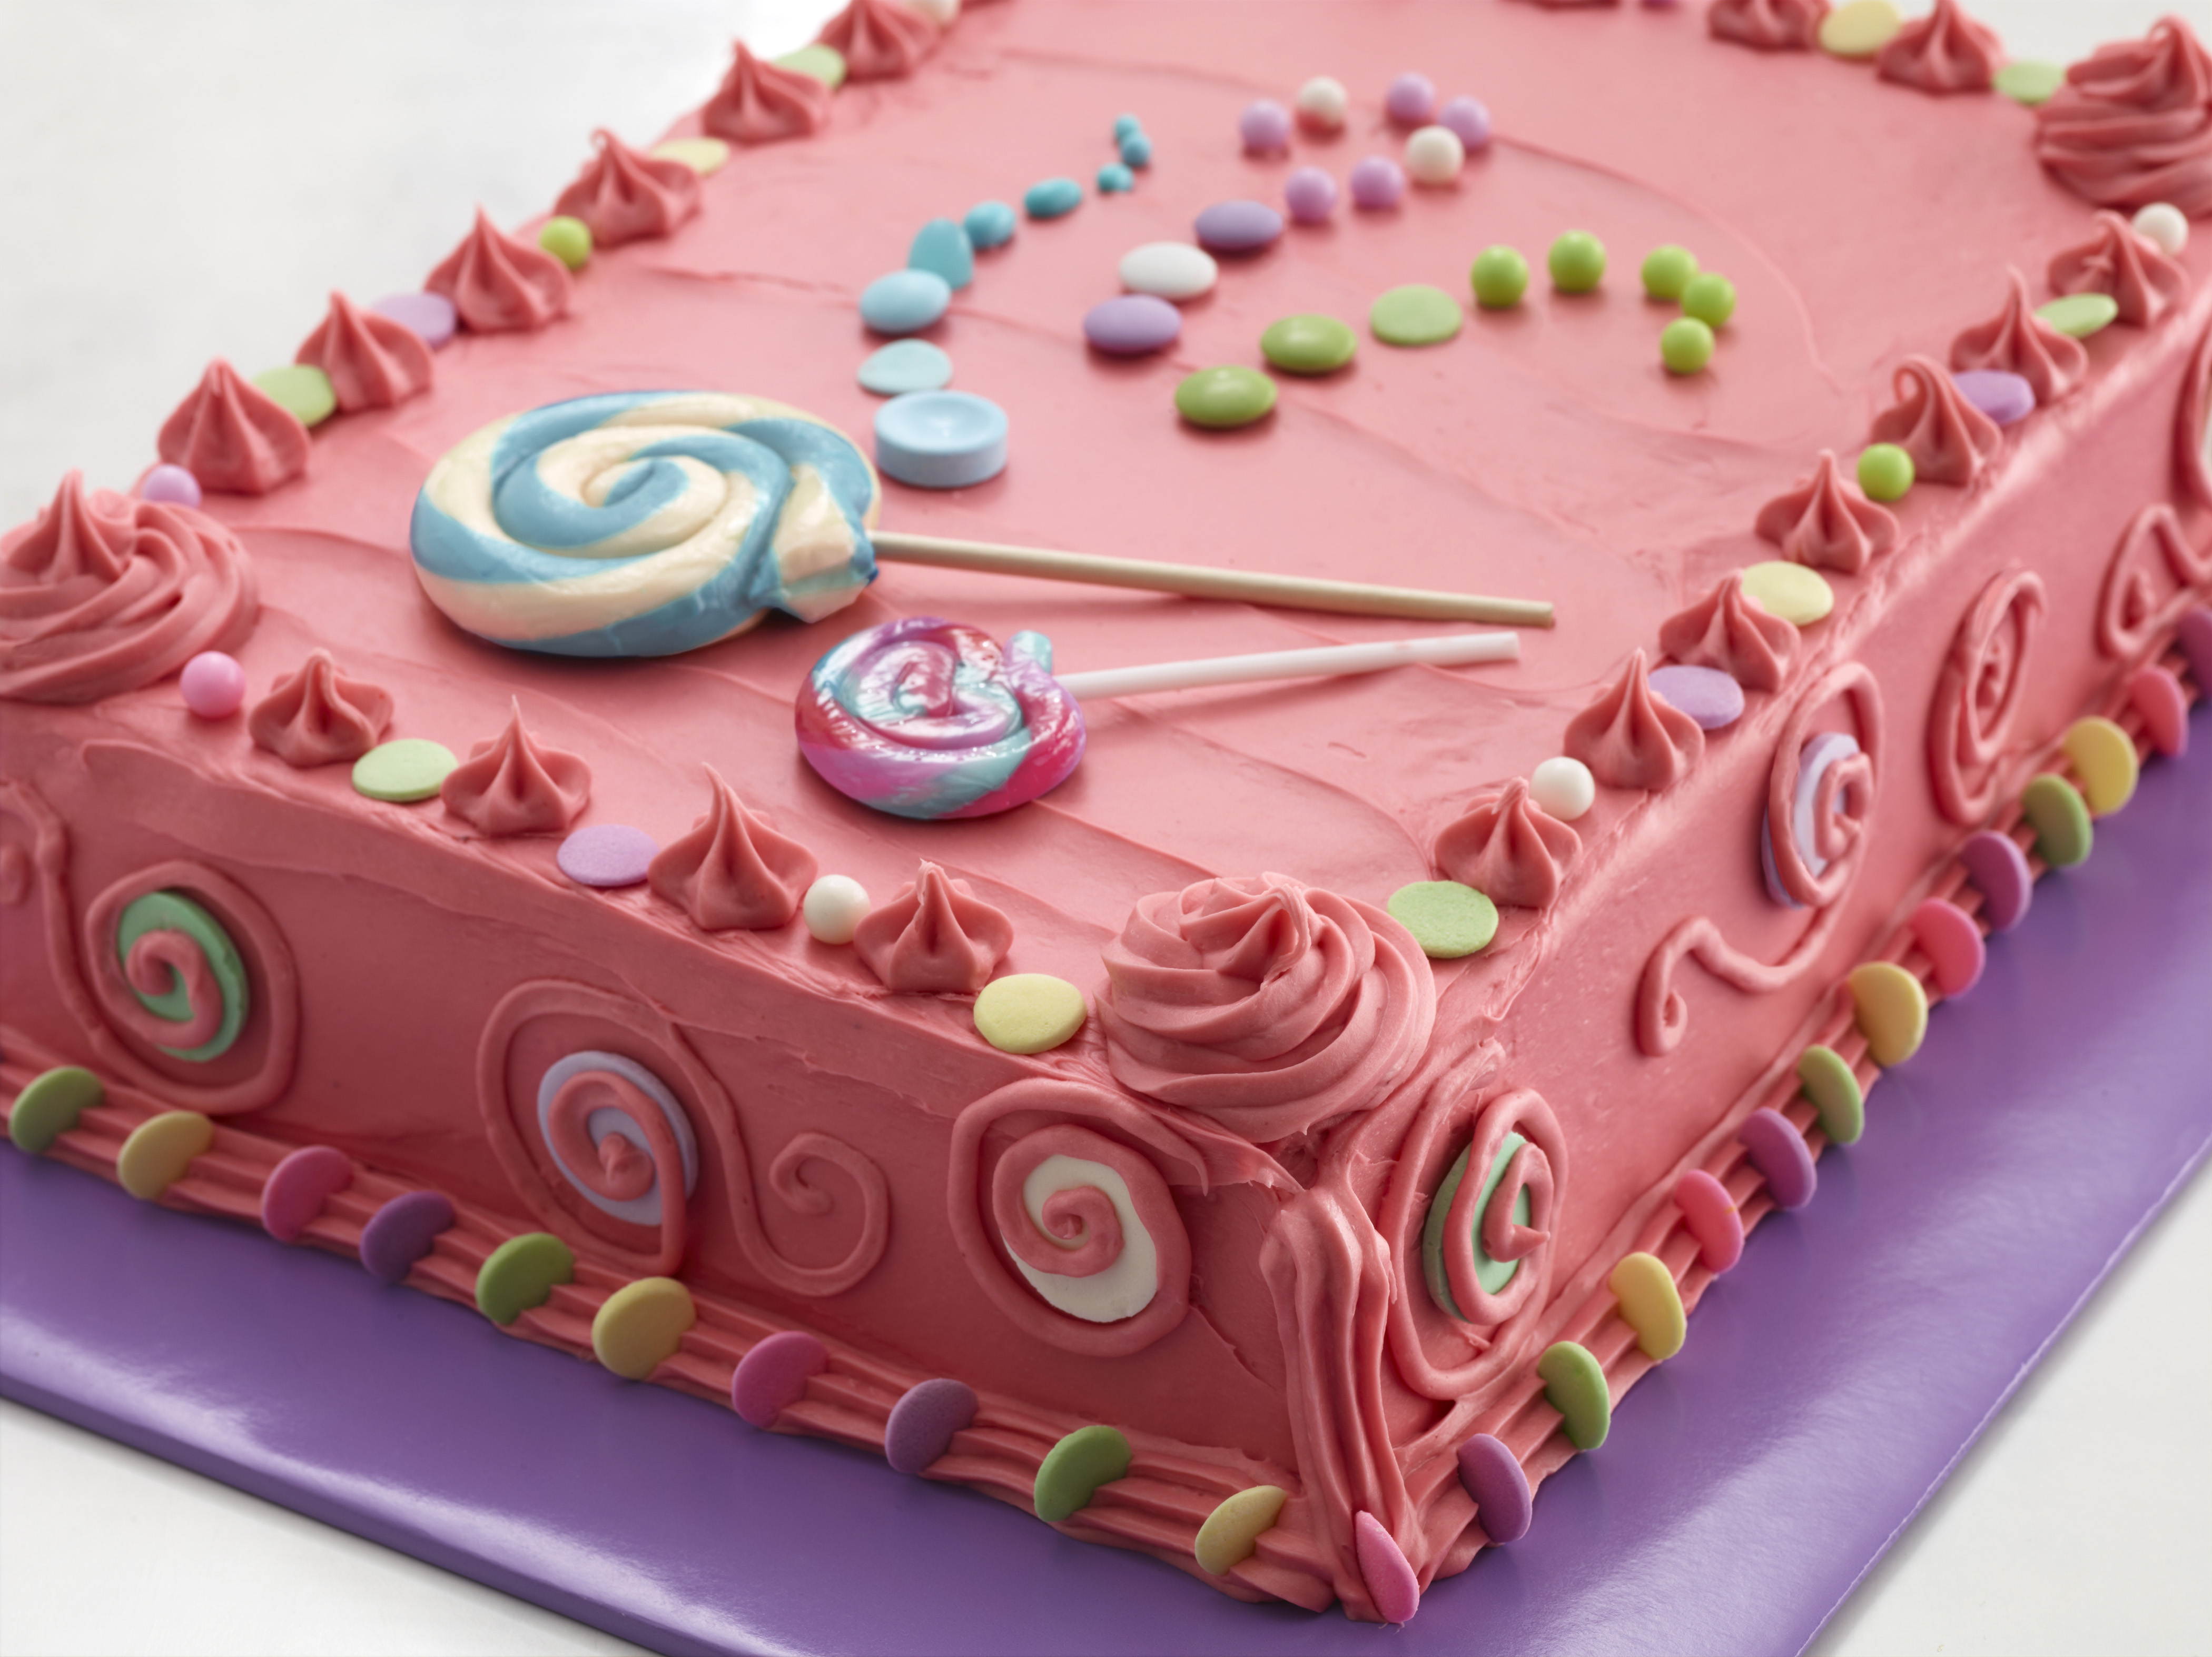 Bubble Gum Candy Cake